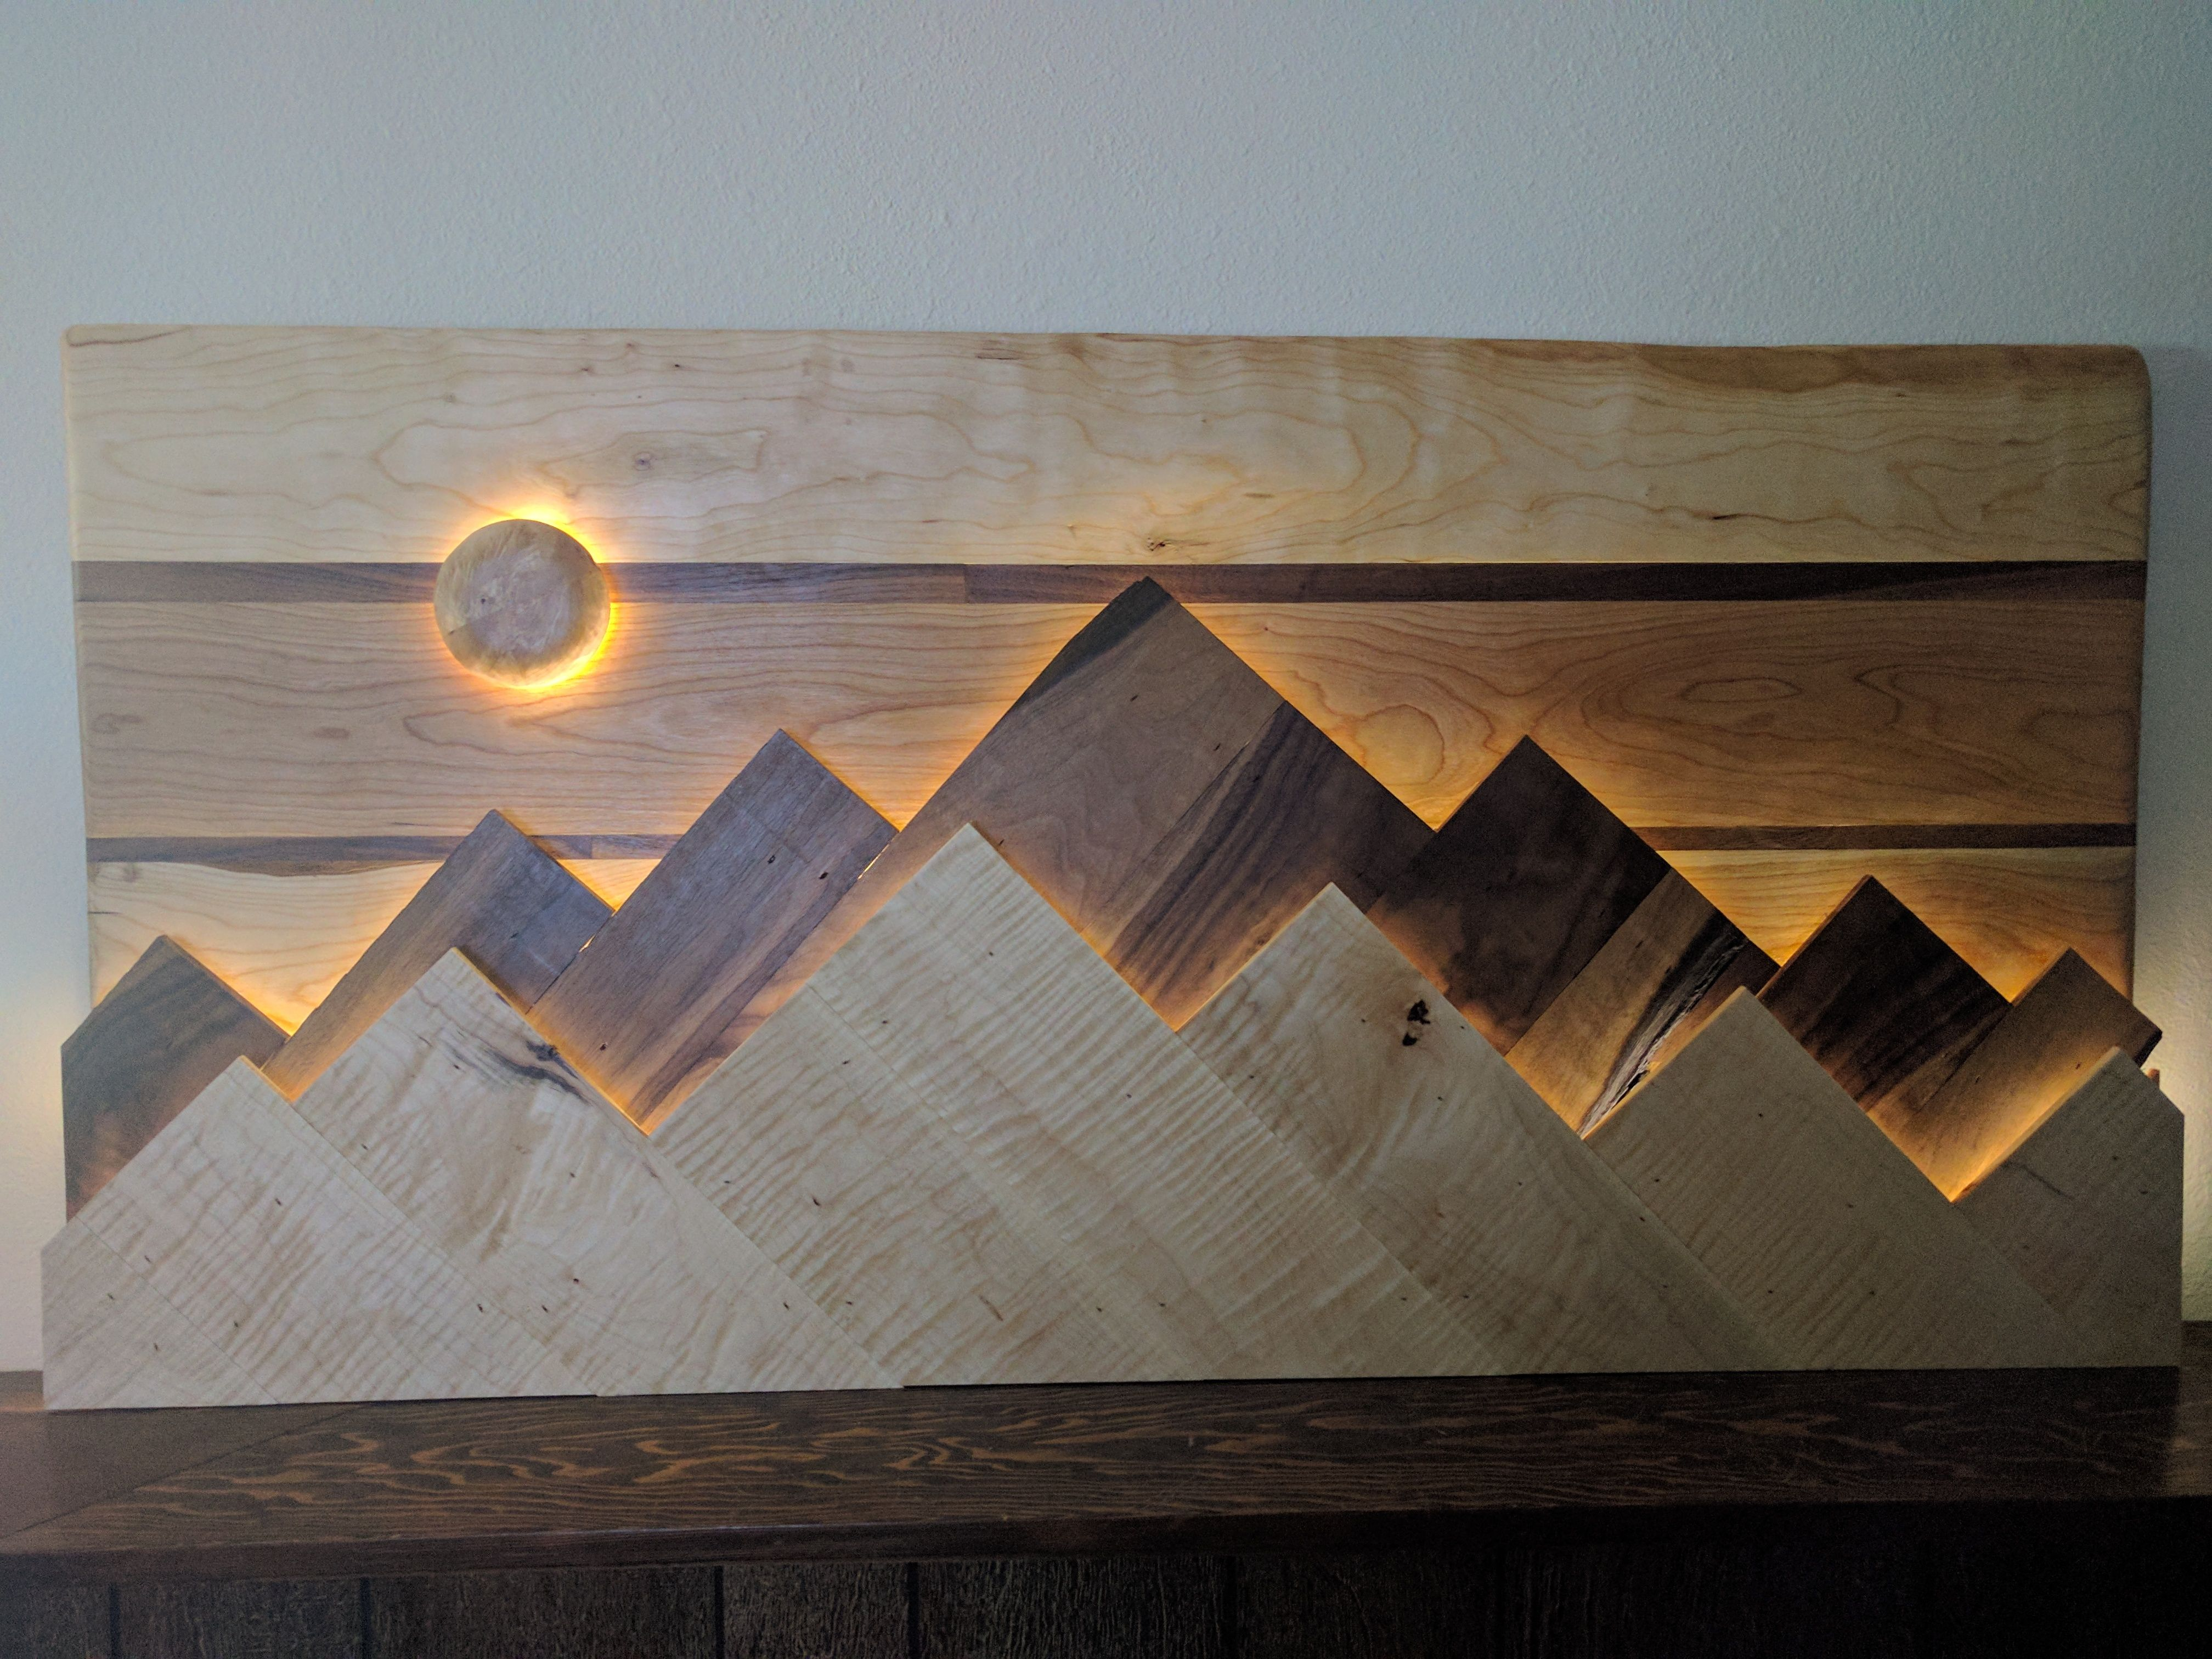 Wood Mountain Range Wall Art. Sun Moon Functions